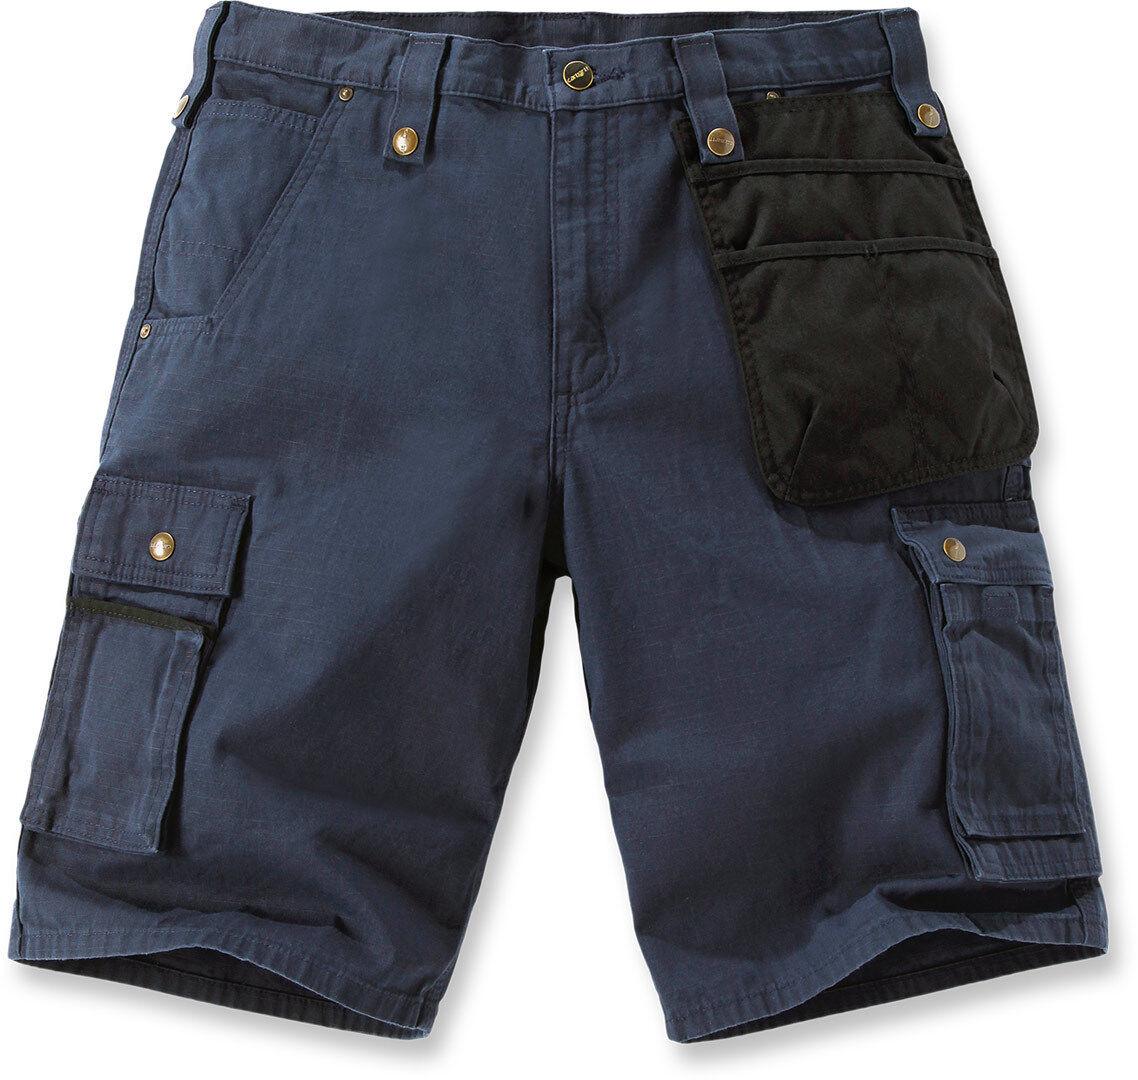 Carhartt Multi Pocket Ripstop Pantalones cortos Azul 34